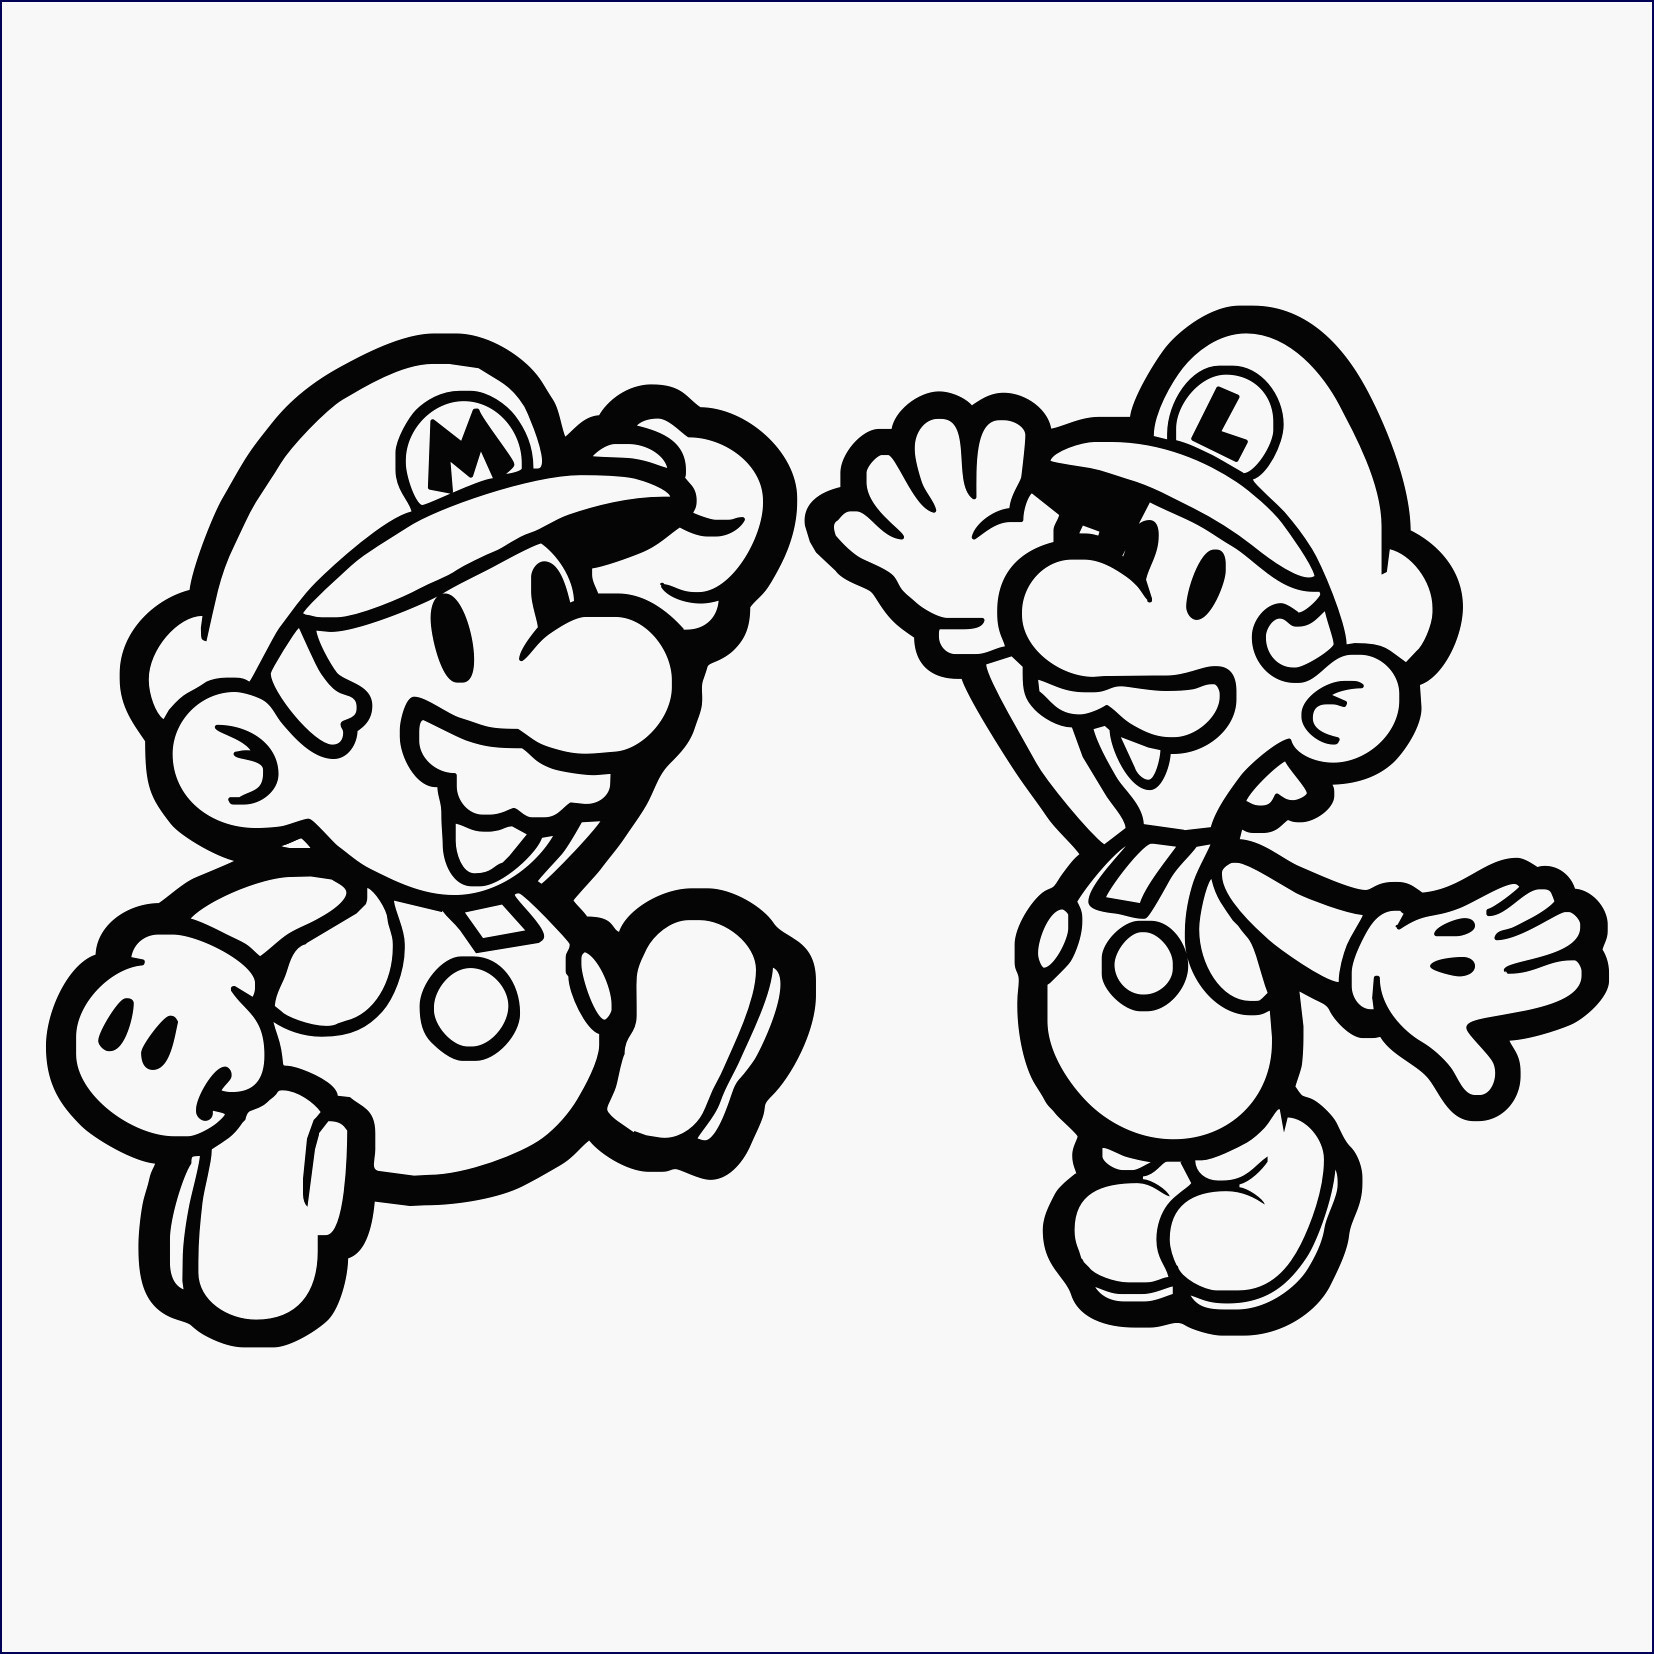 Donkey Kong Ausmalbilder Genial Coloring Pages Brother Awesome Inspirierende Ausmalbilder Mario Fotografieren